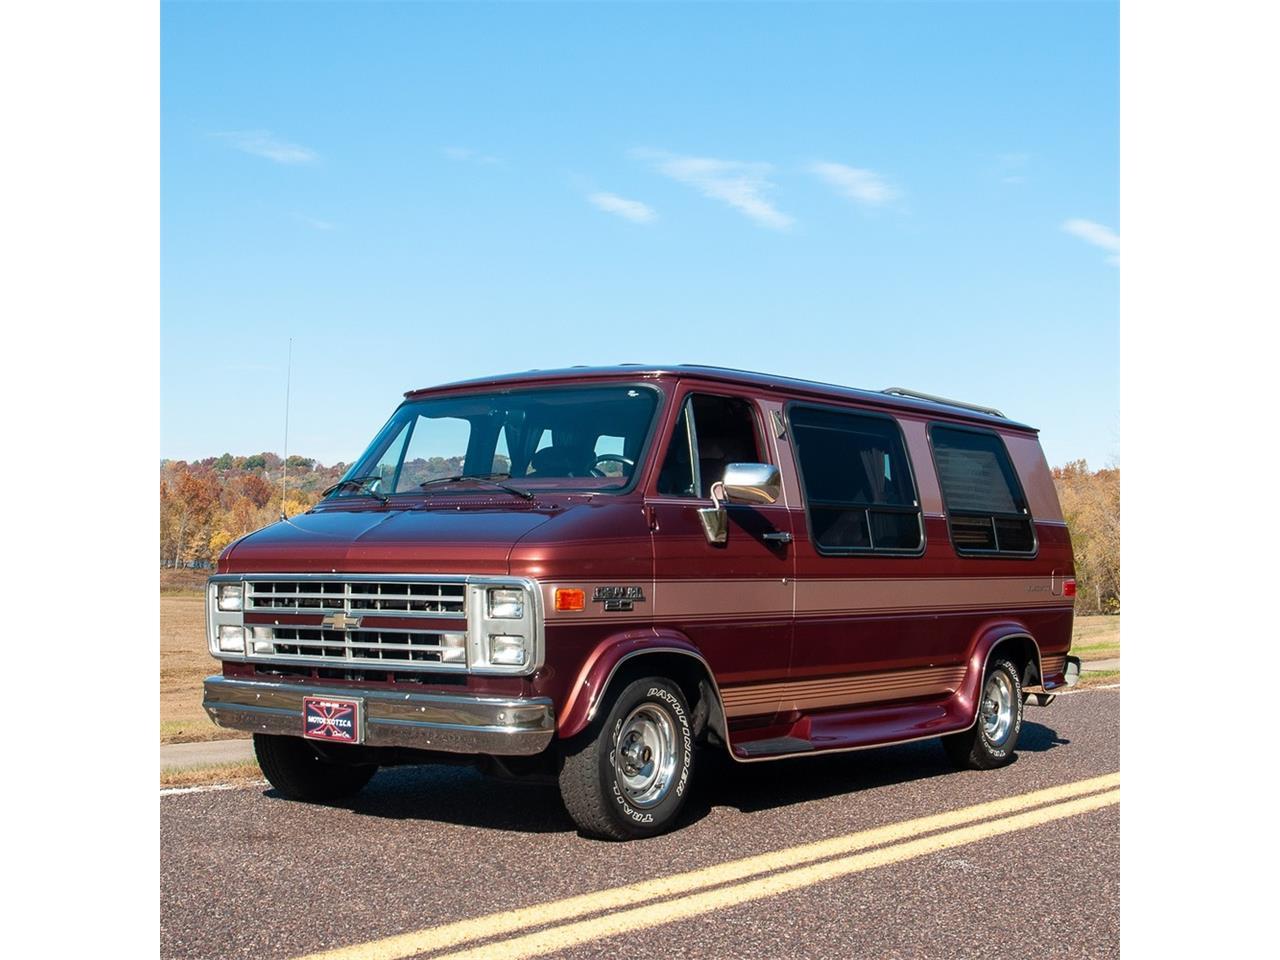 For Sale: 1991 Chevrolet G20 Conversion Van in St  Louis, Missouri